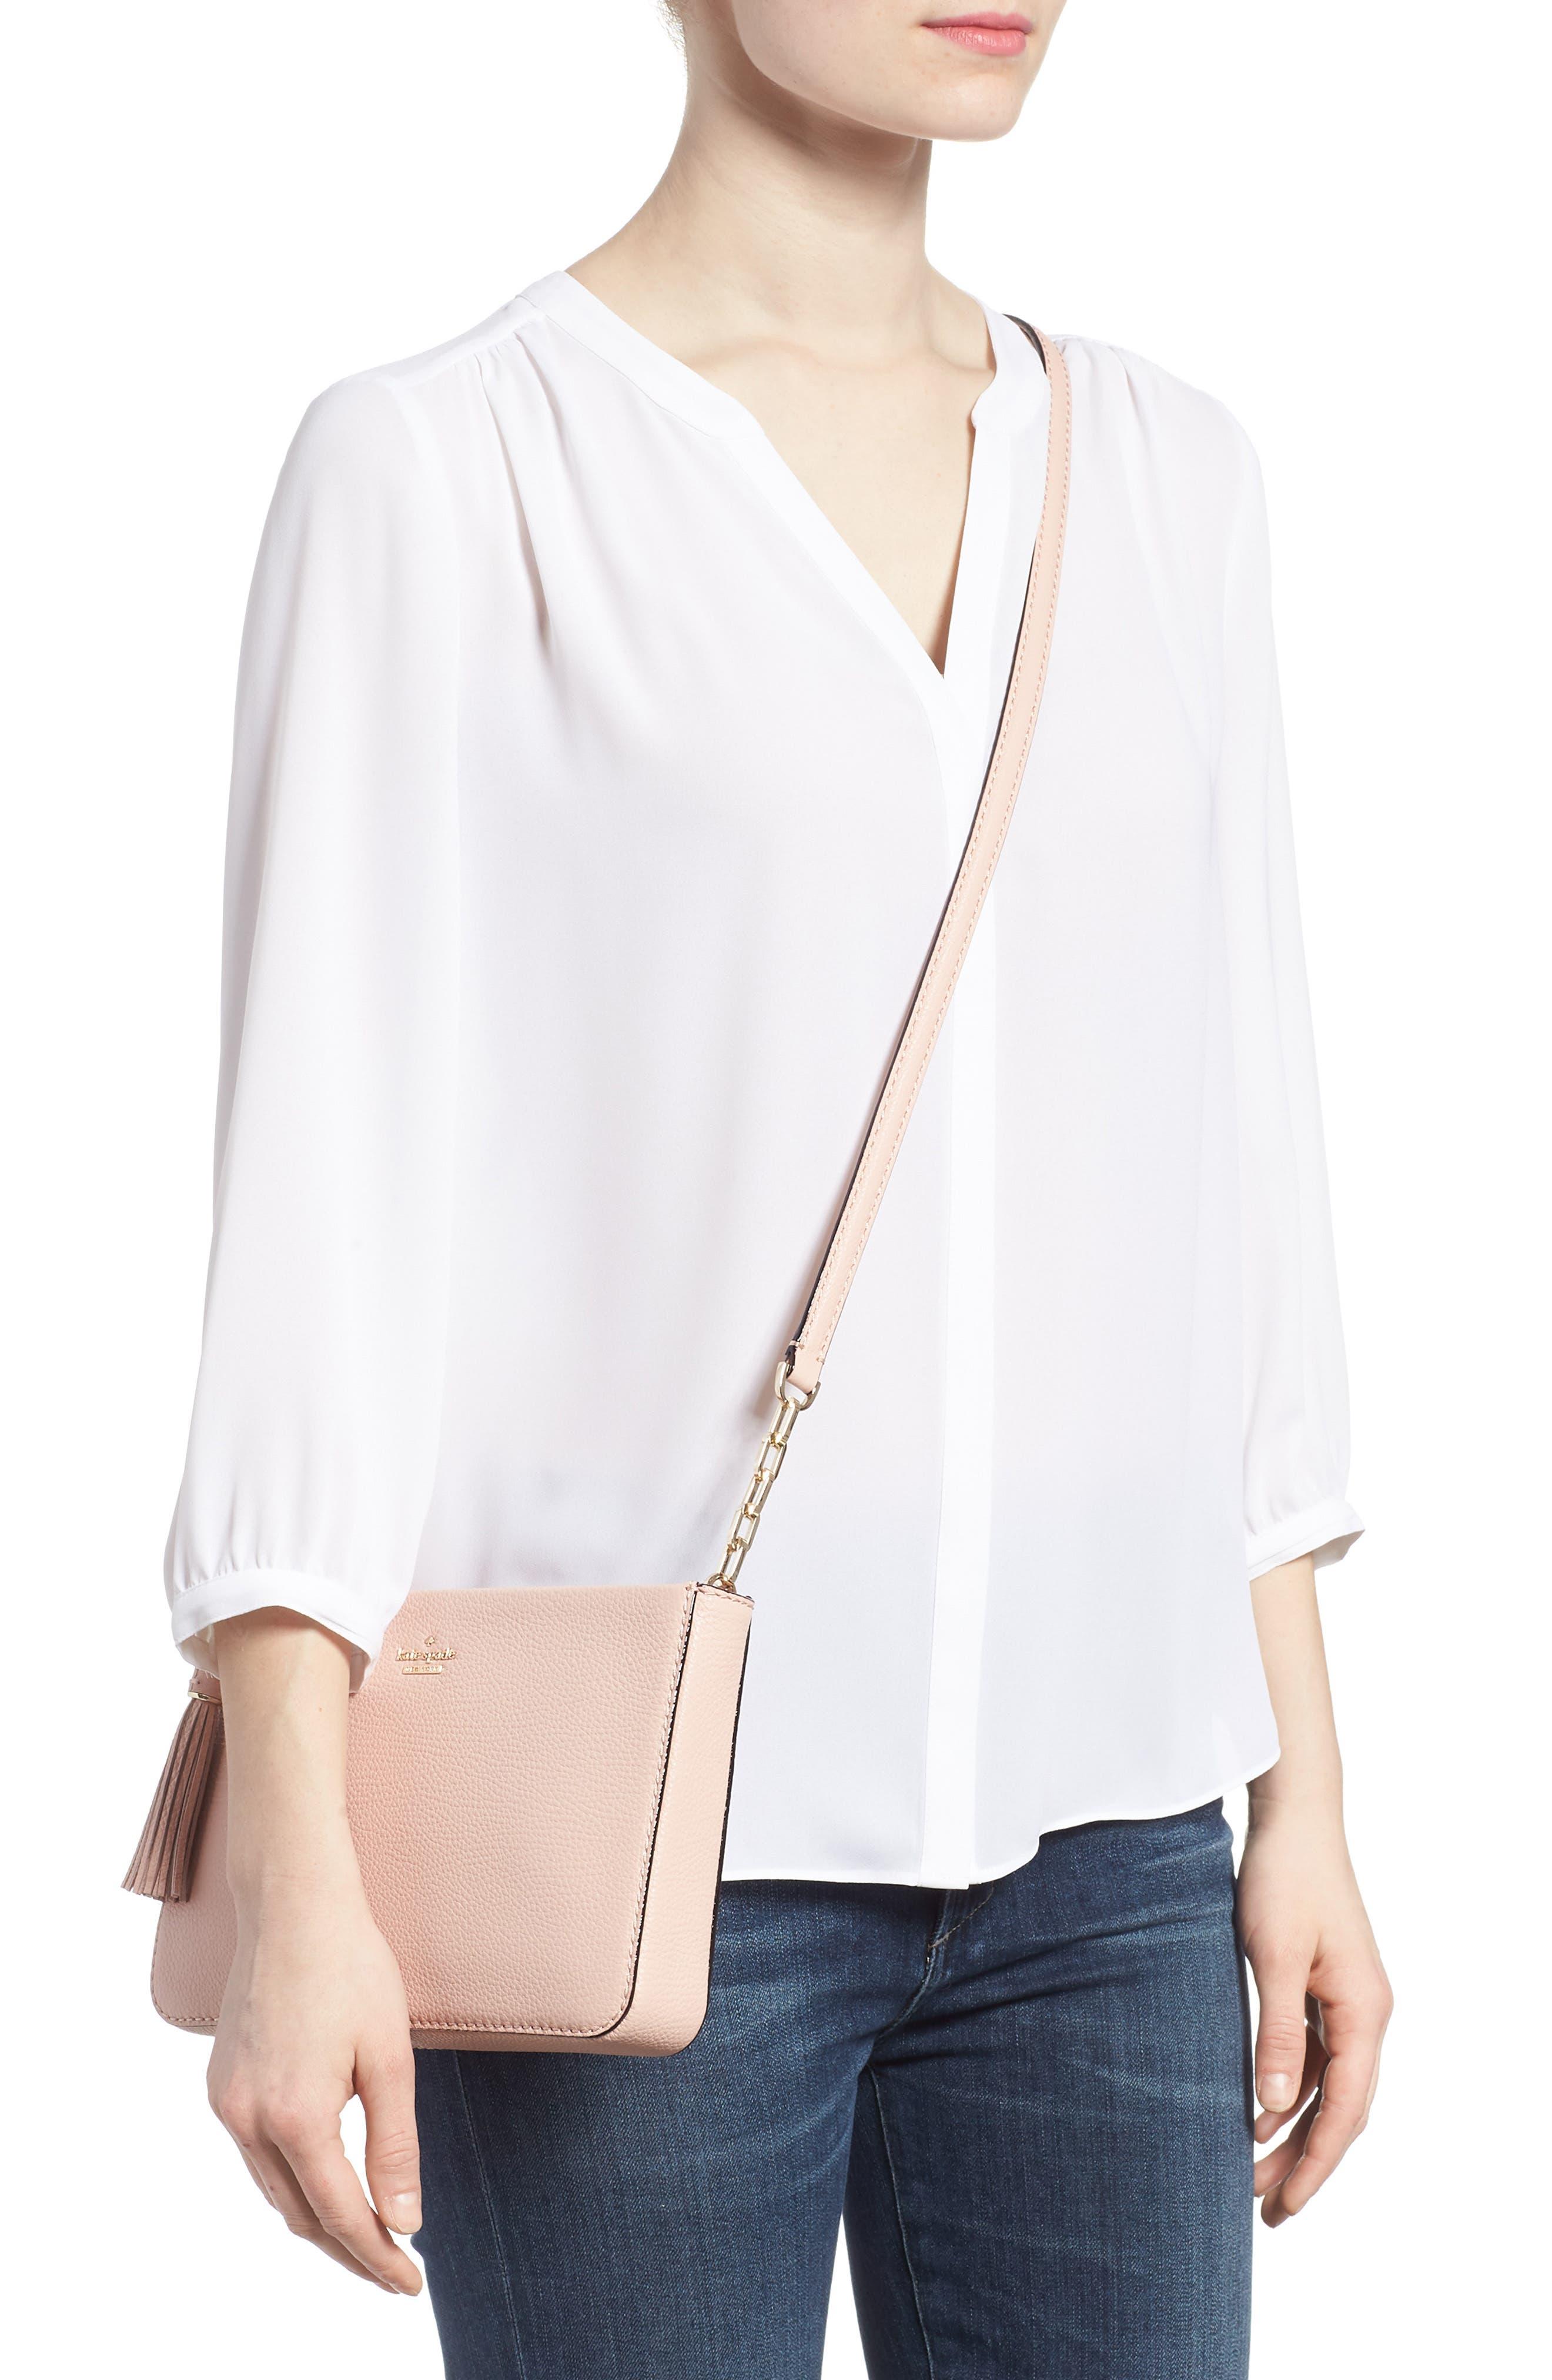 kingston drive - alessa leather shoulder/crossbody bag,                             Alternate thumbnail 2, color,                             Warm Vellum